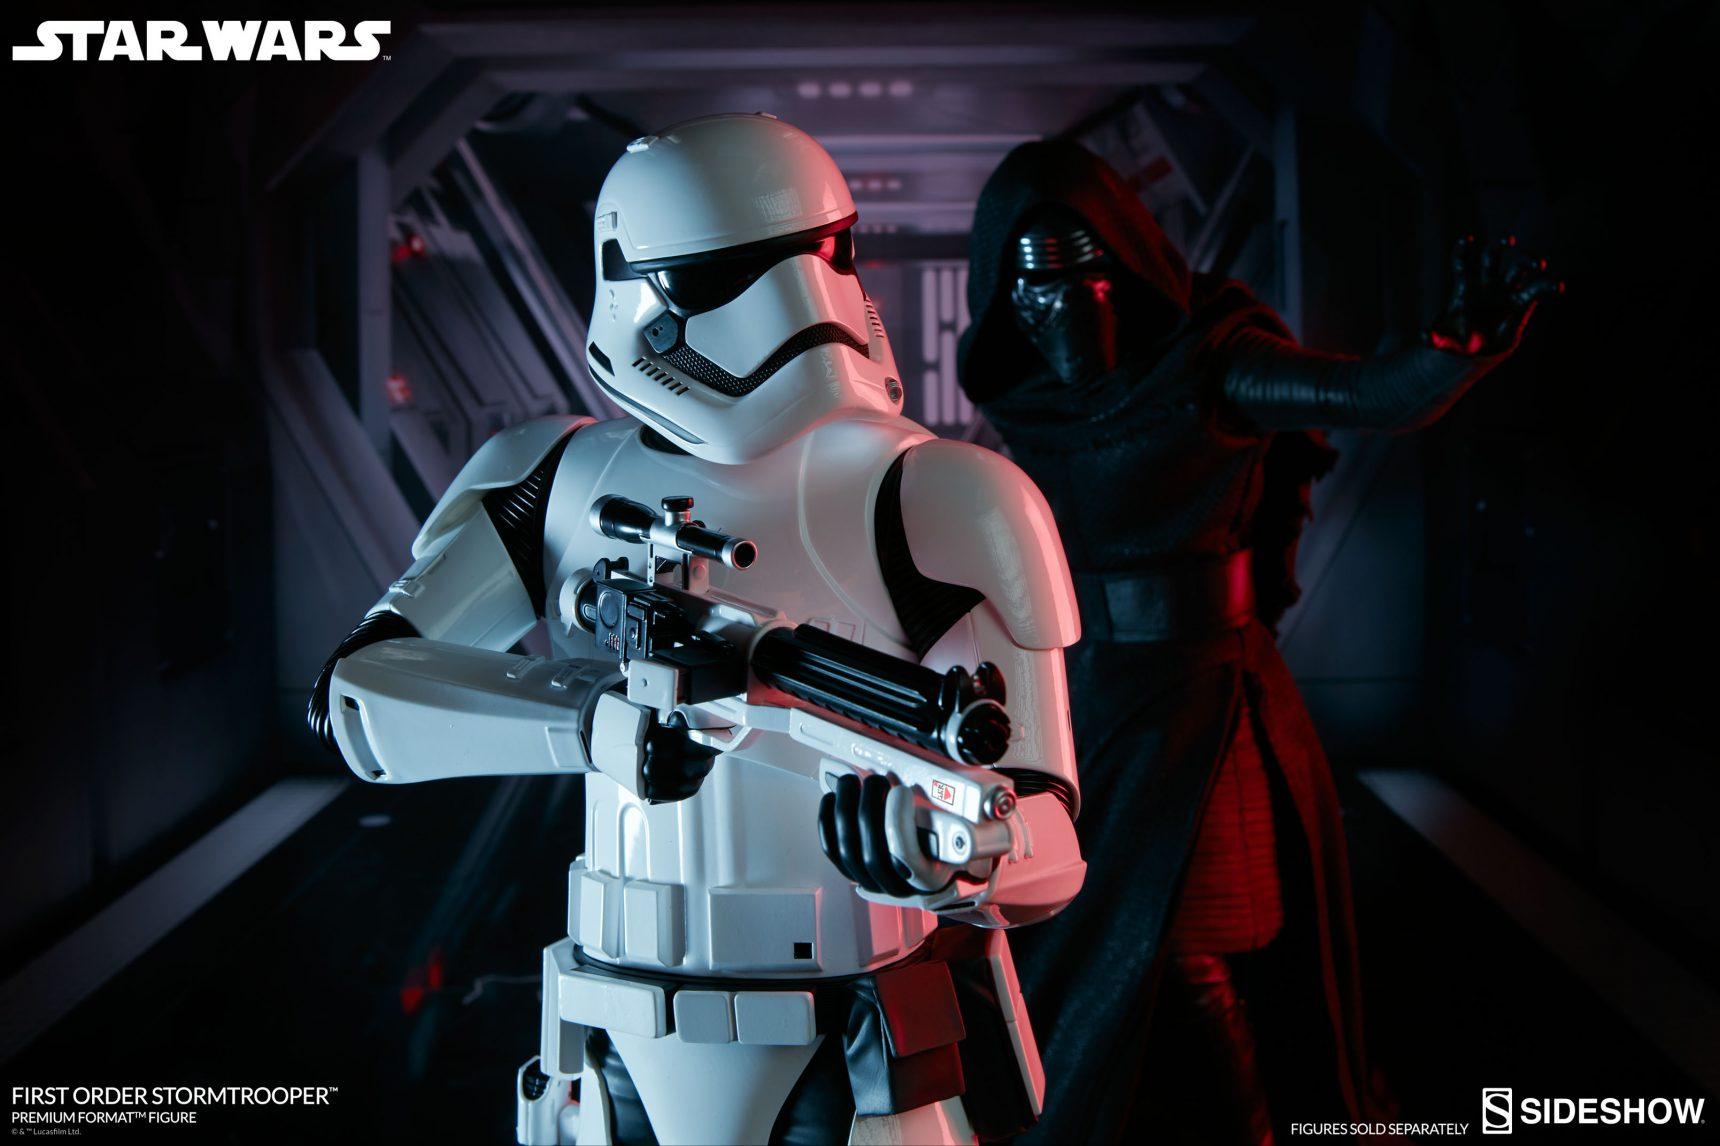 First Order Stormtrooper Premium Format (11)